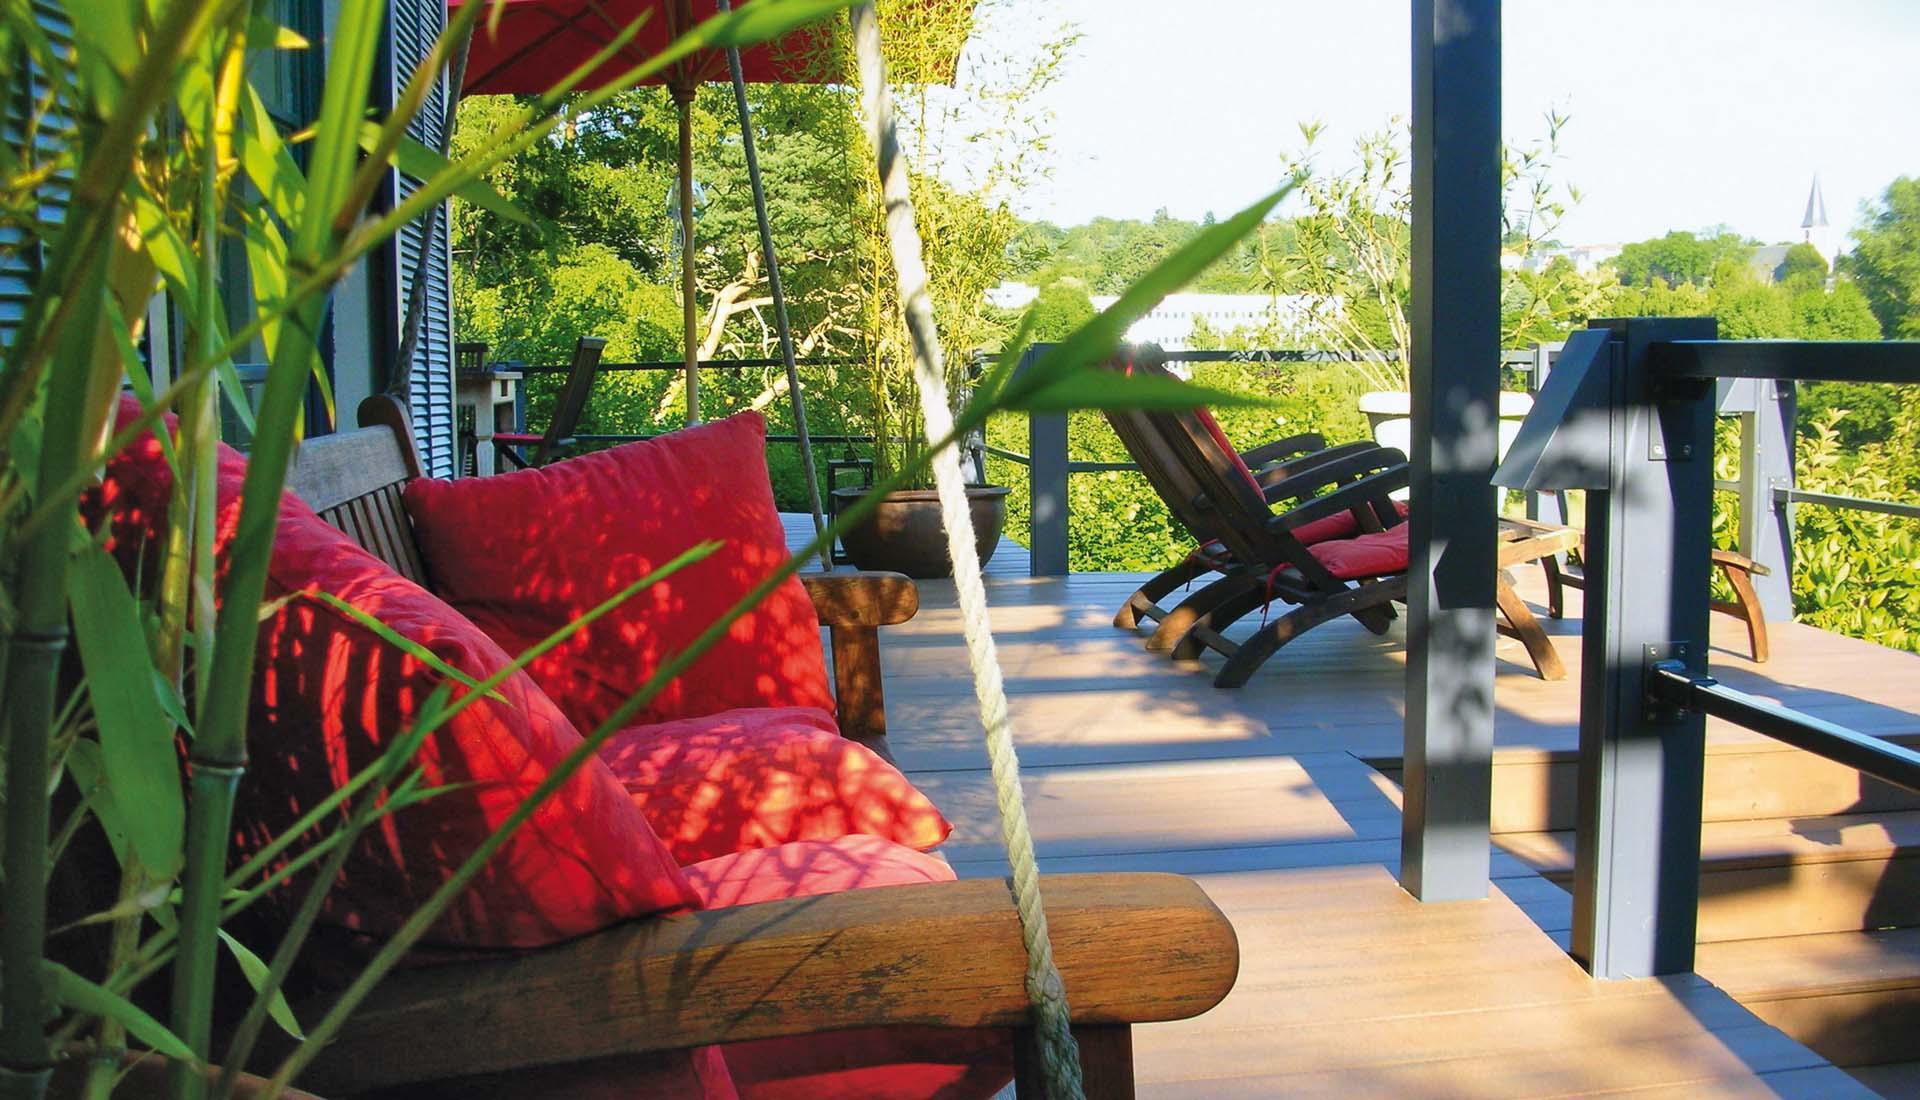 Balkon Asiatisch balkon asiatisch gestalten ihausdesign co